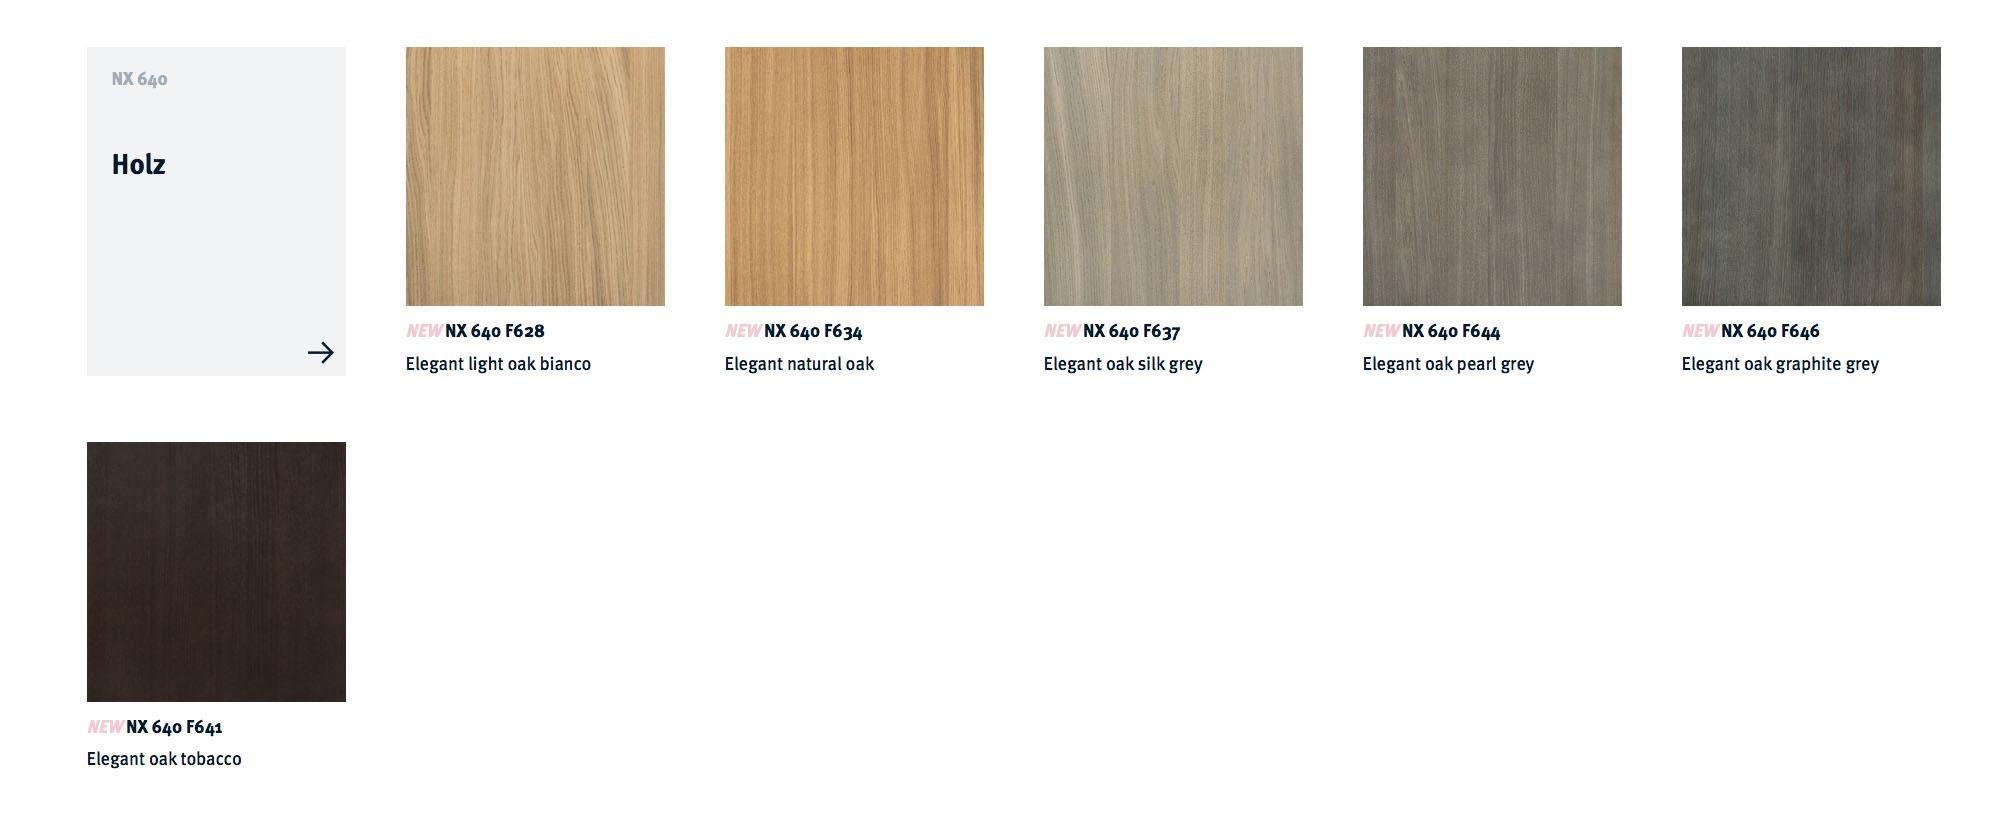 next125 kitchens - nx640 colour choices